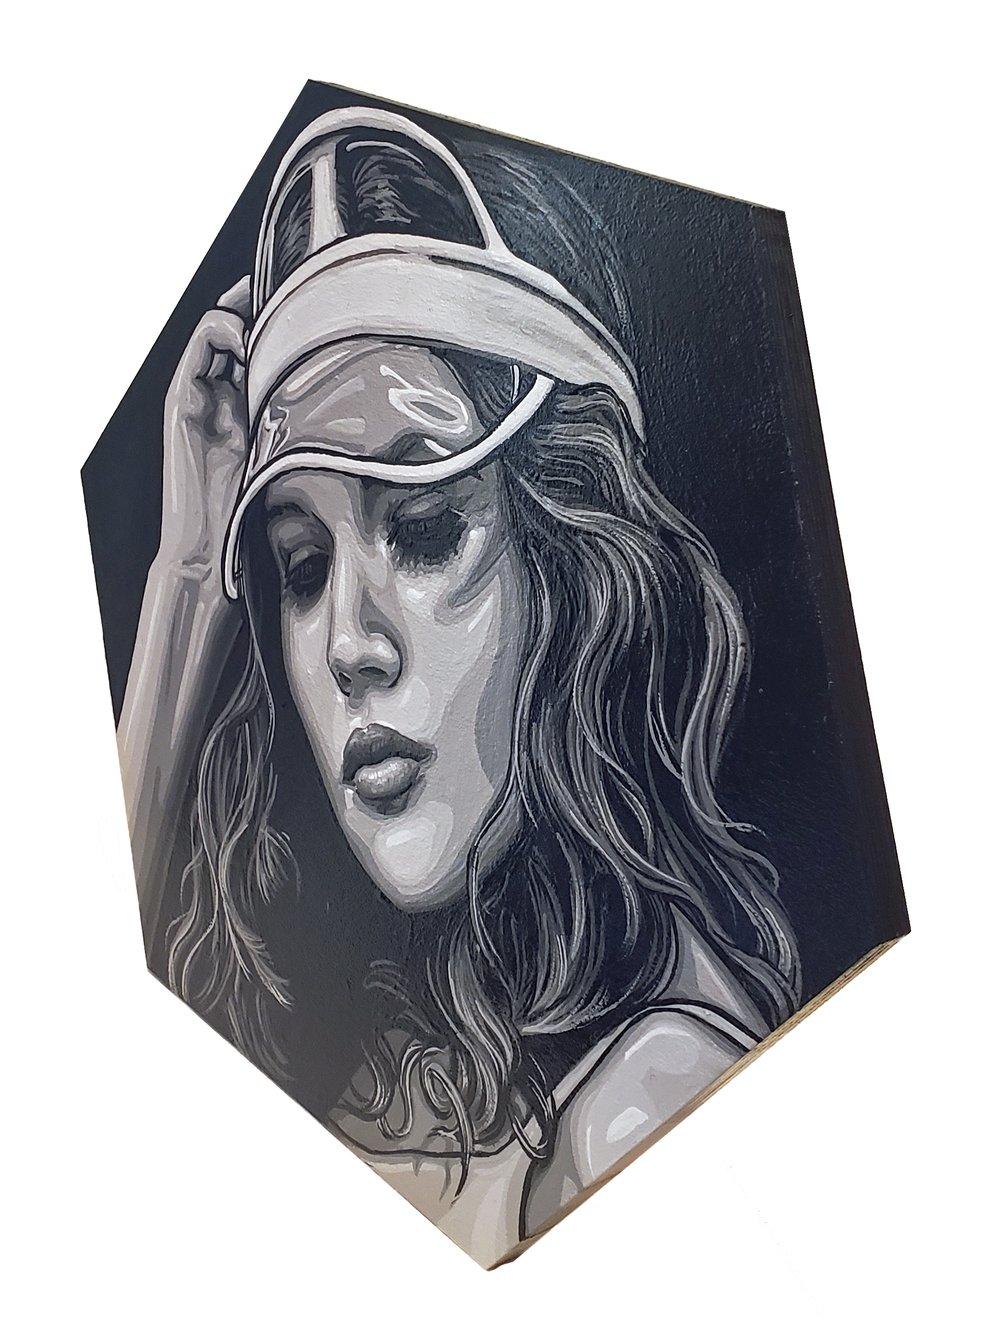 Extra Shady Edition: Visor - Original Painting